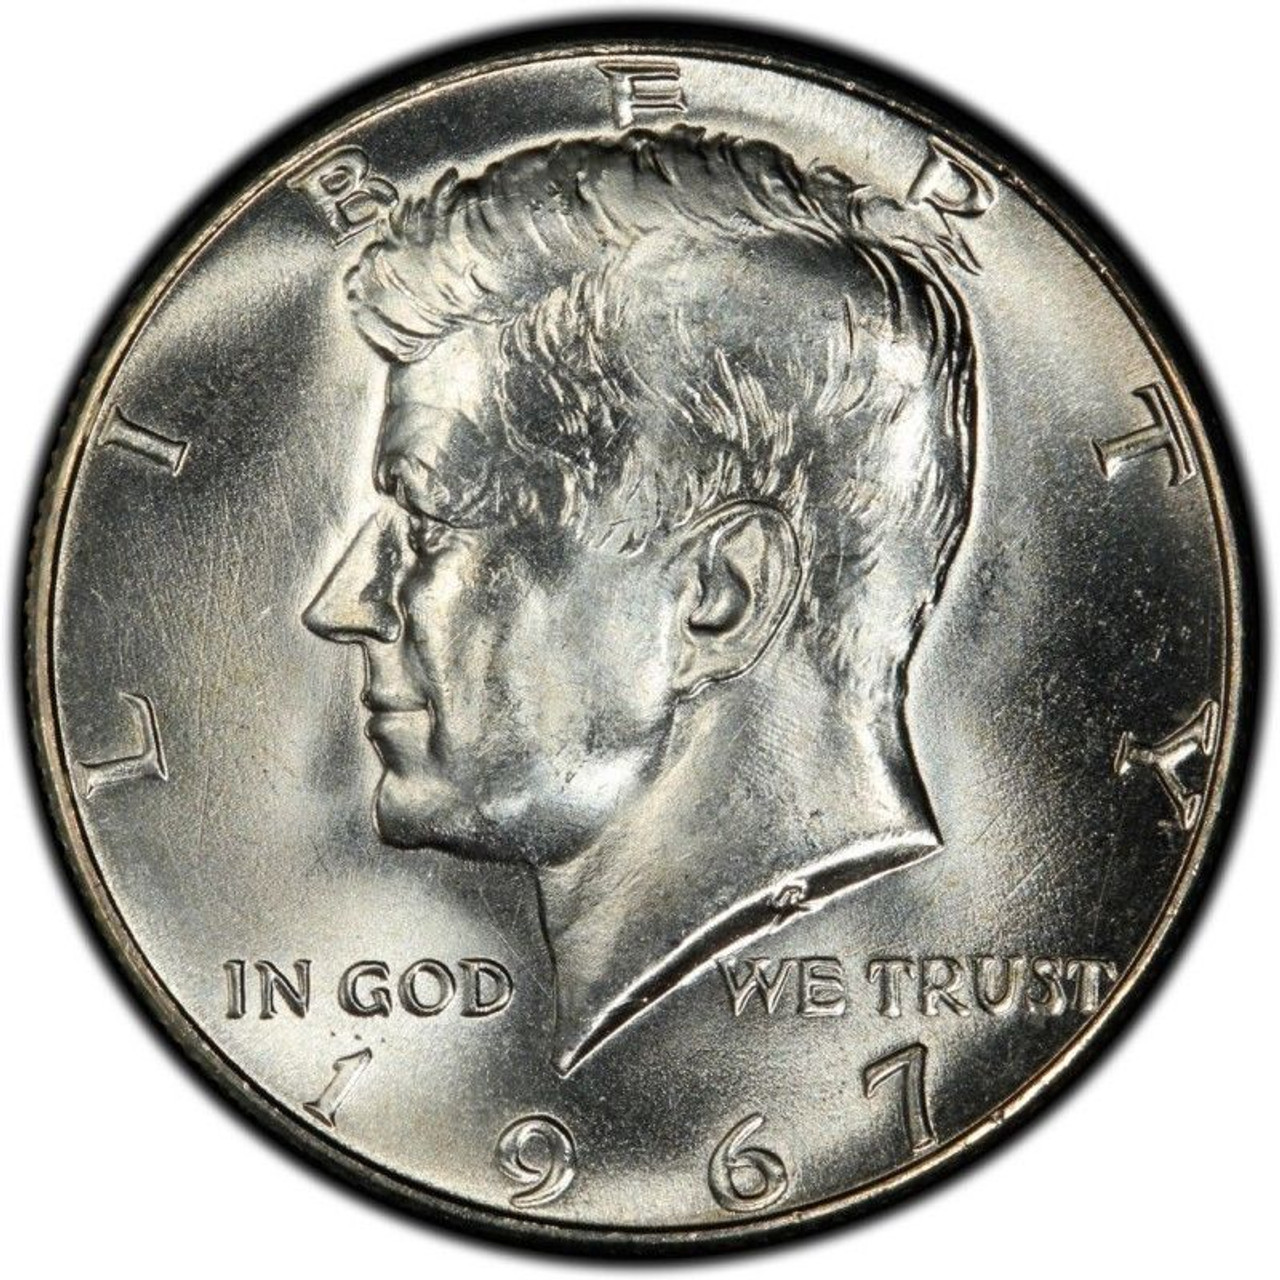 1967 quarter worth any money